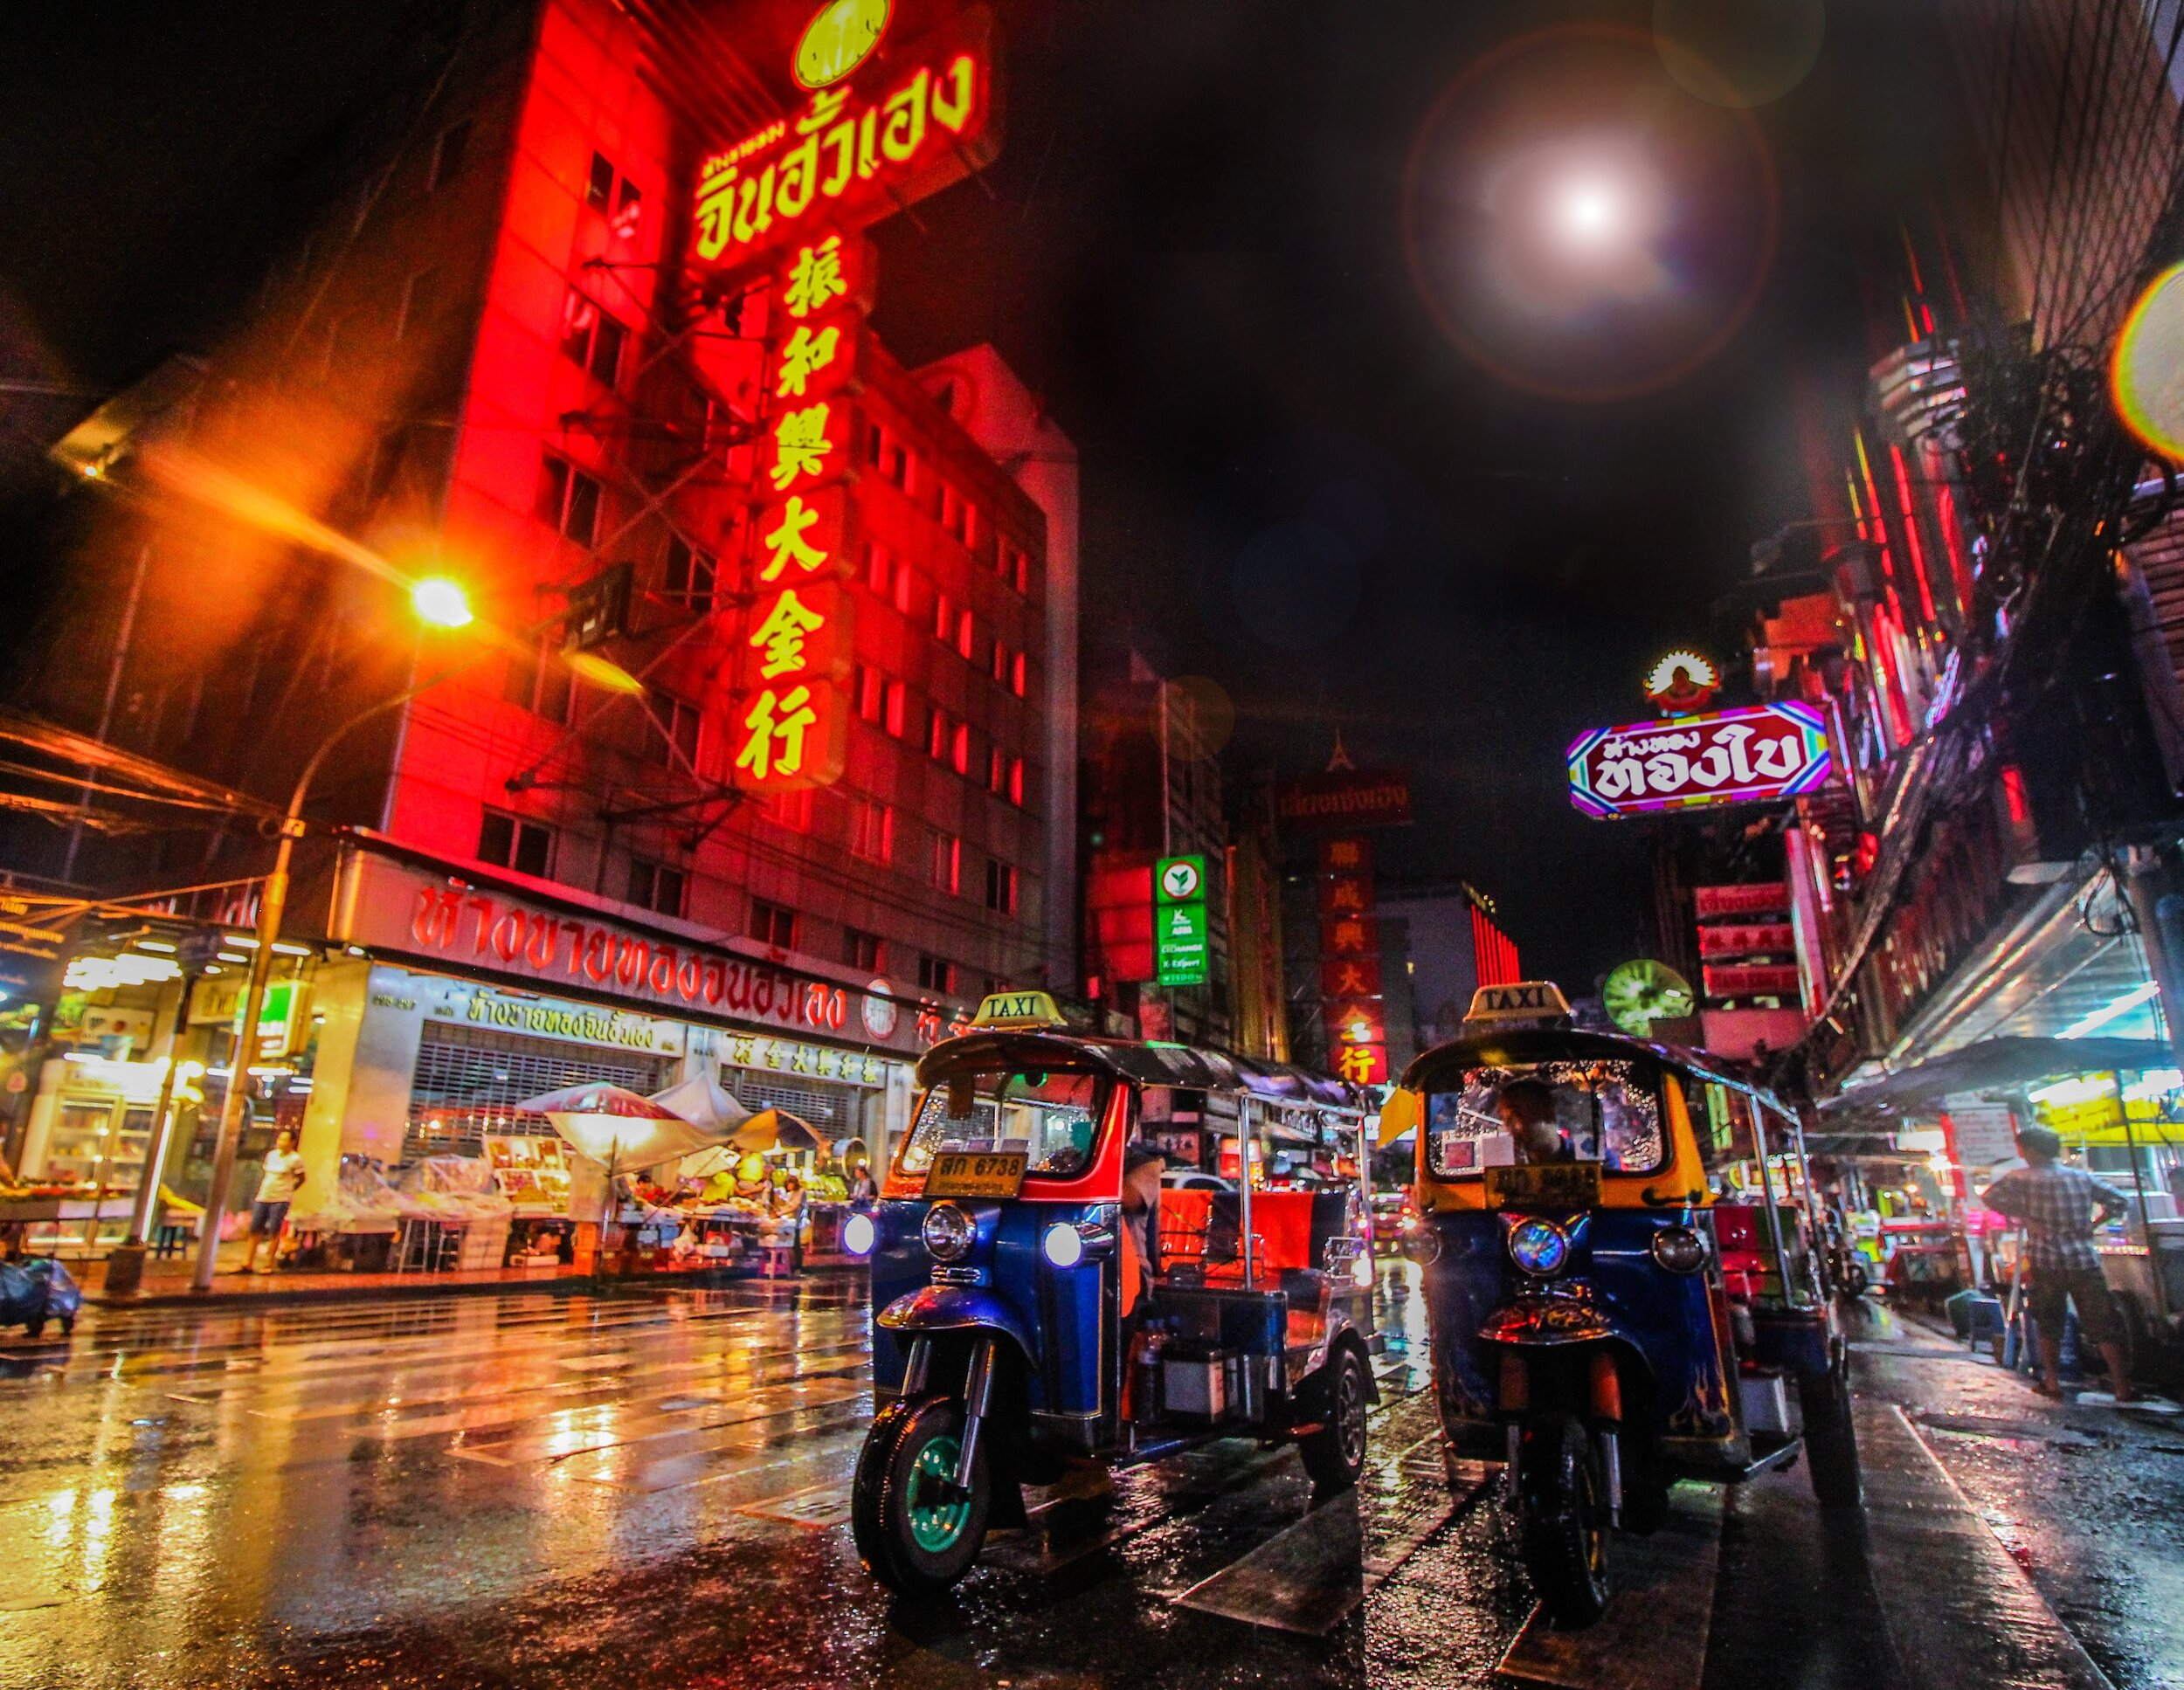 Thailand_florian-wehde--y3sidWvDxg-unsplash.jpg